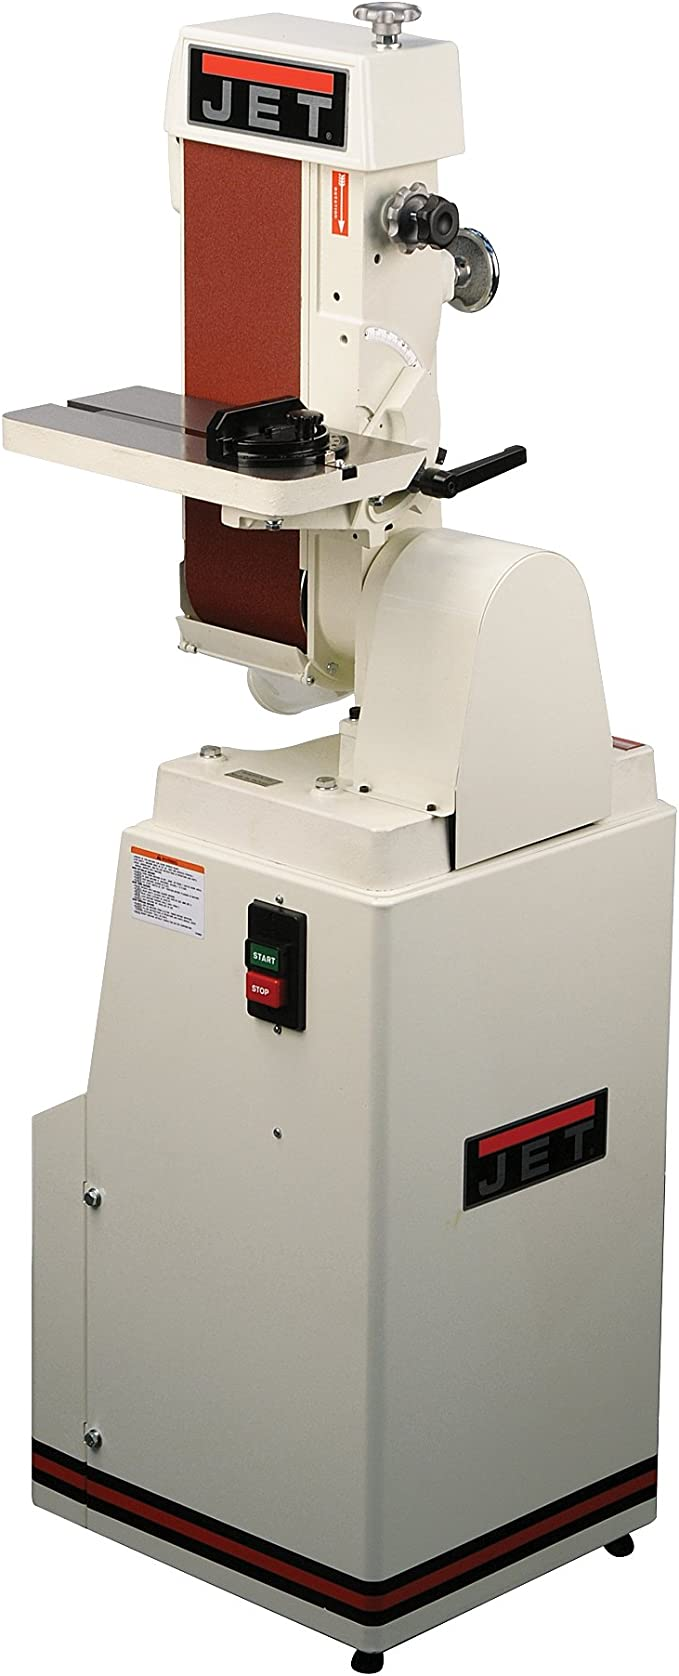 JET J-4300A 6-Inch by 48-Inch Single Phase Industrial Belt Machine